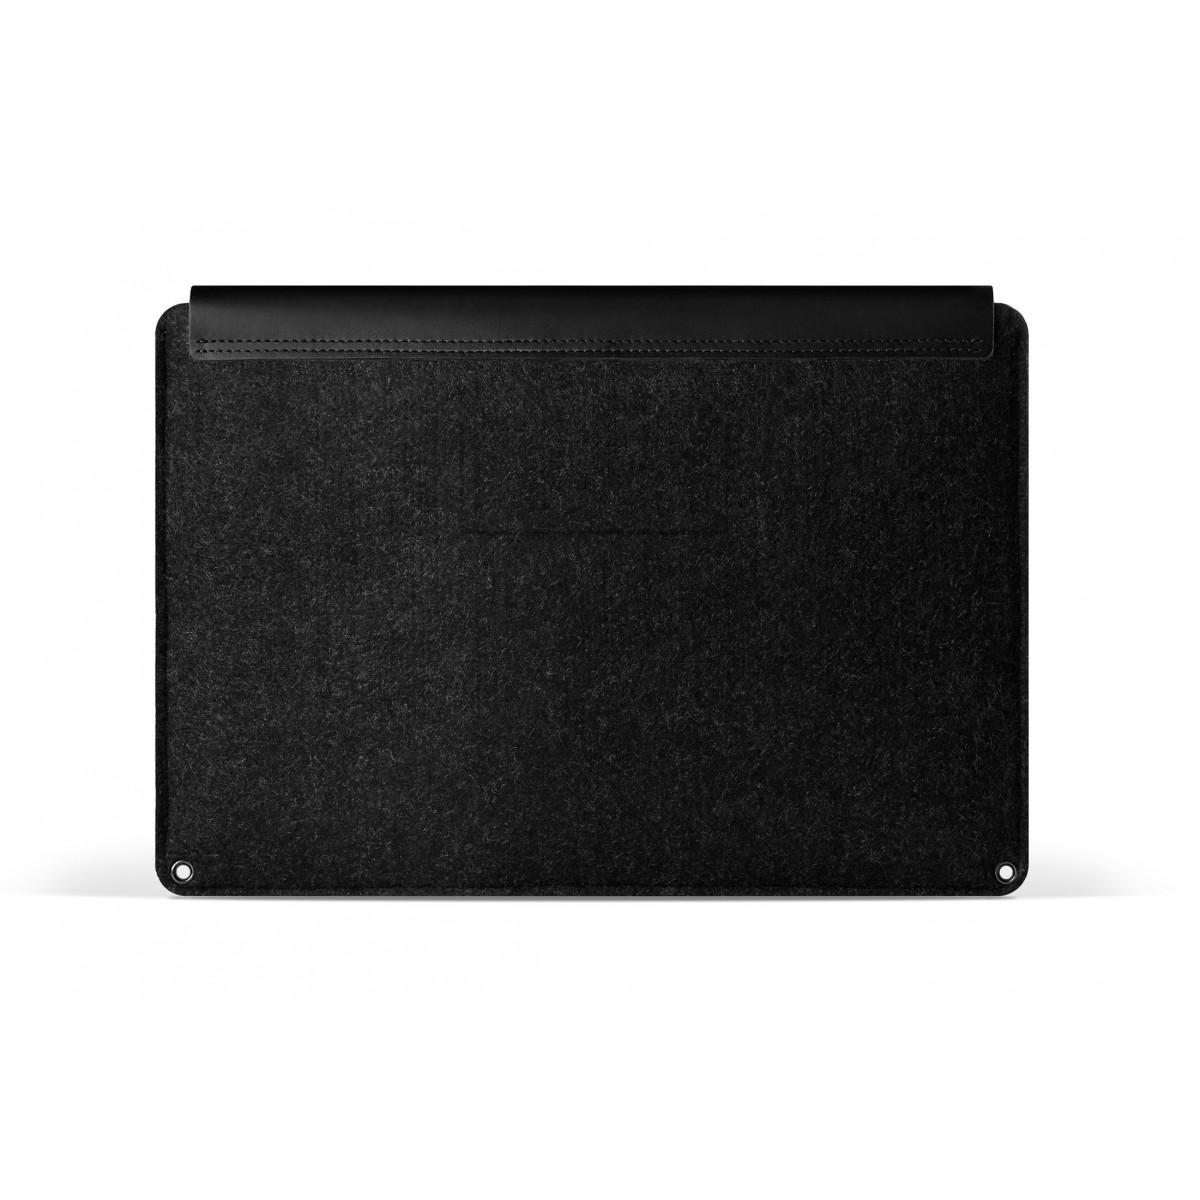 mujjo 15 macbook pro retina sleeve mukama. Black Bedroom Furniture Sets. Home Design Ideas